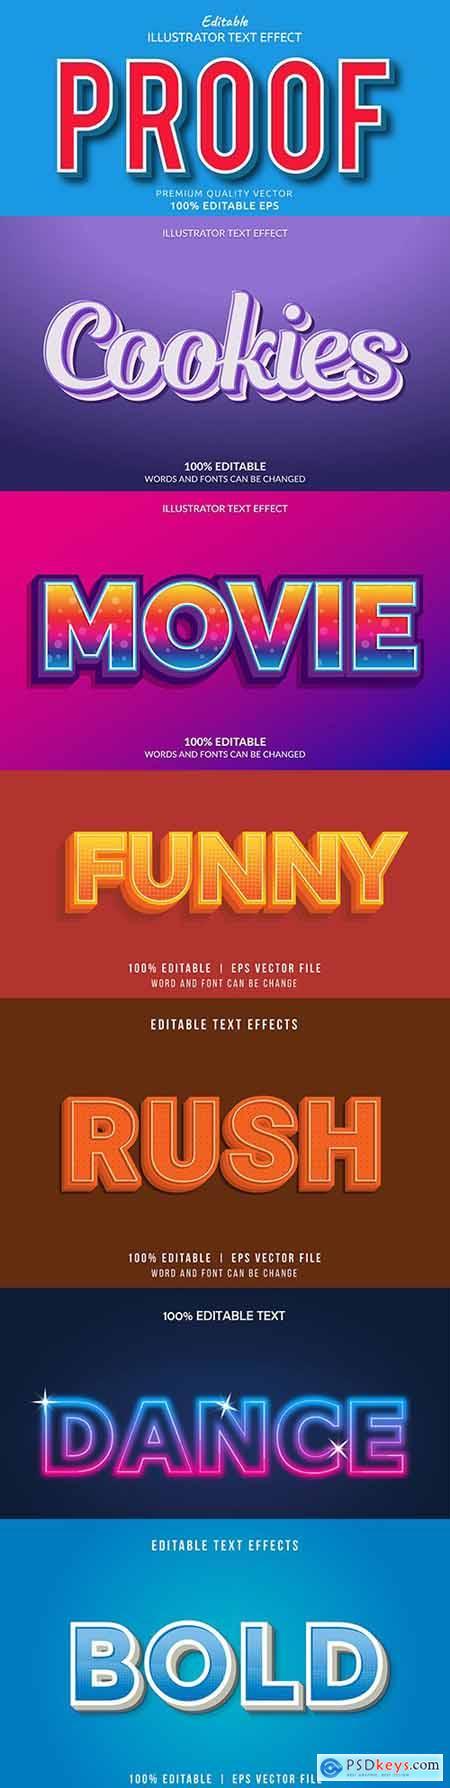 Editable font effect text collection illustration design 102